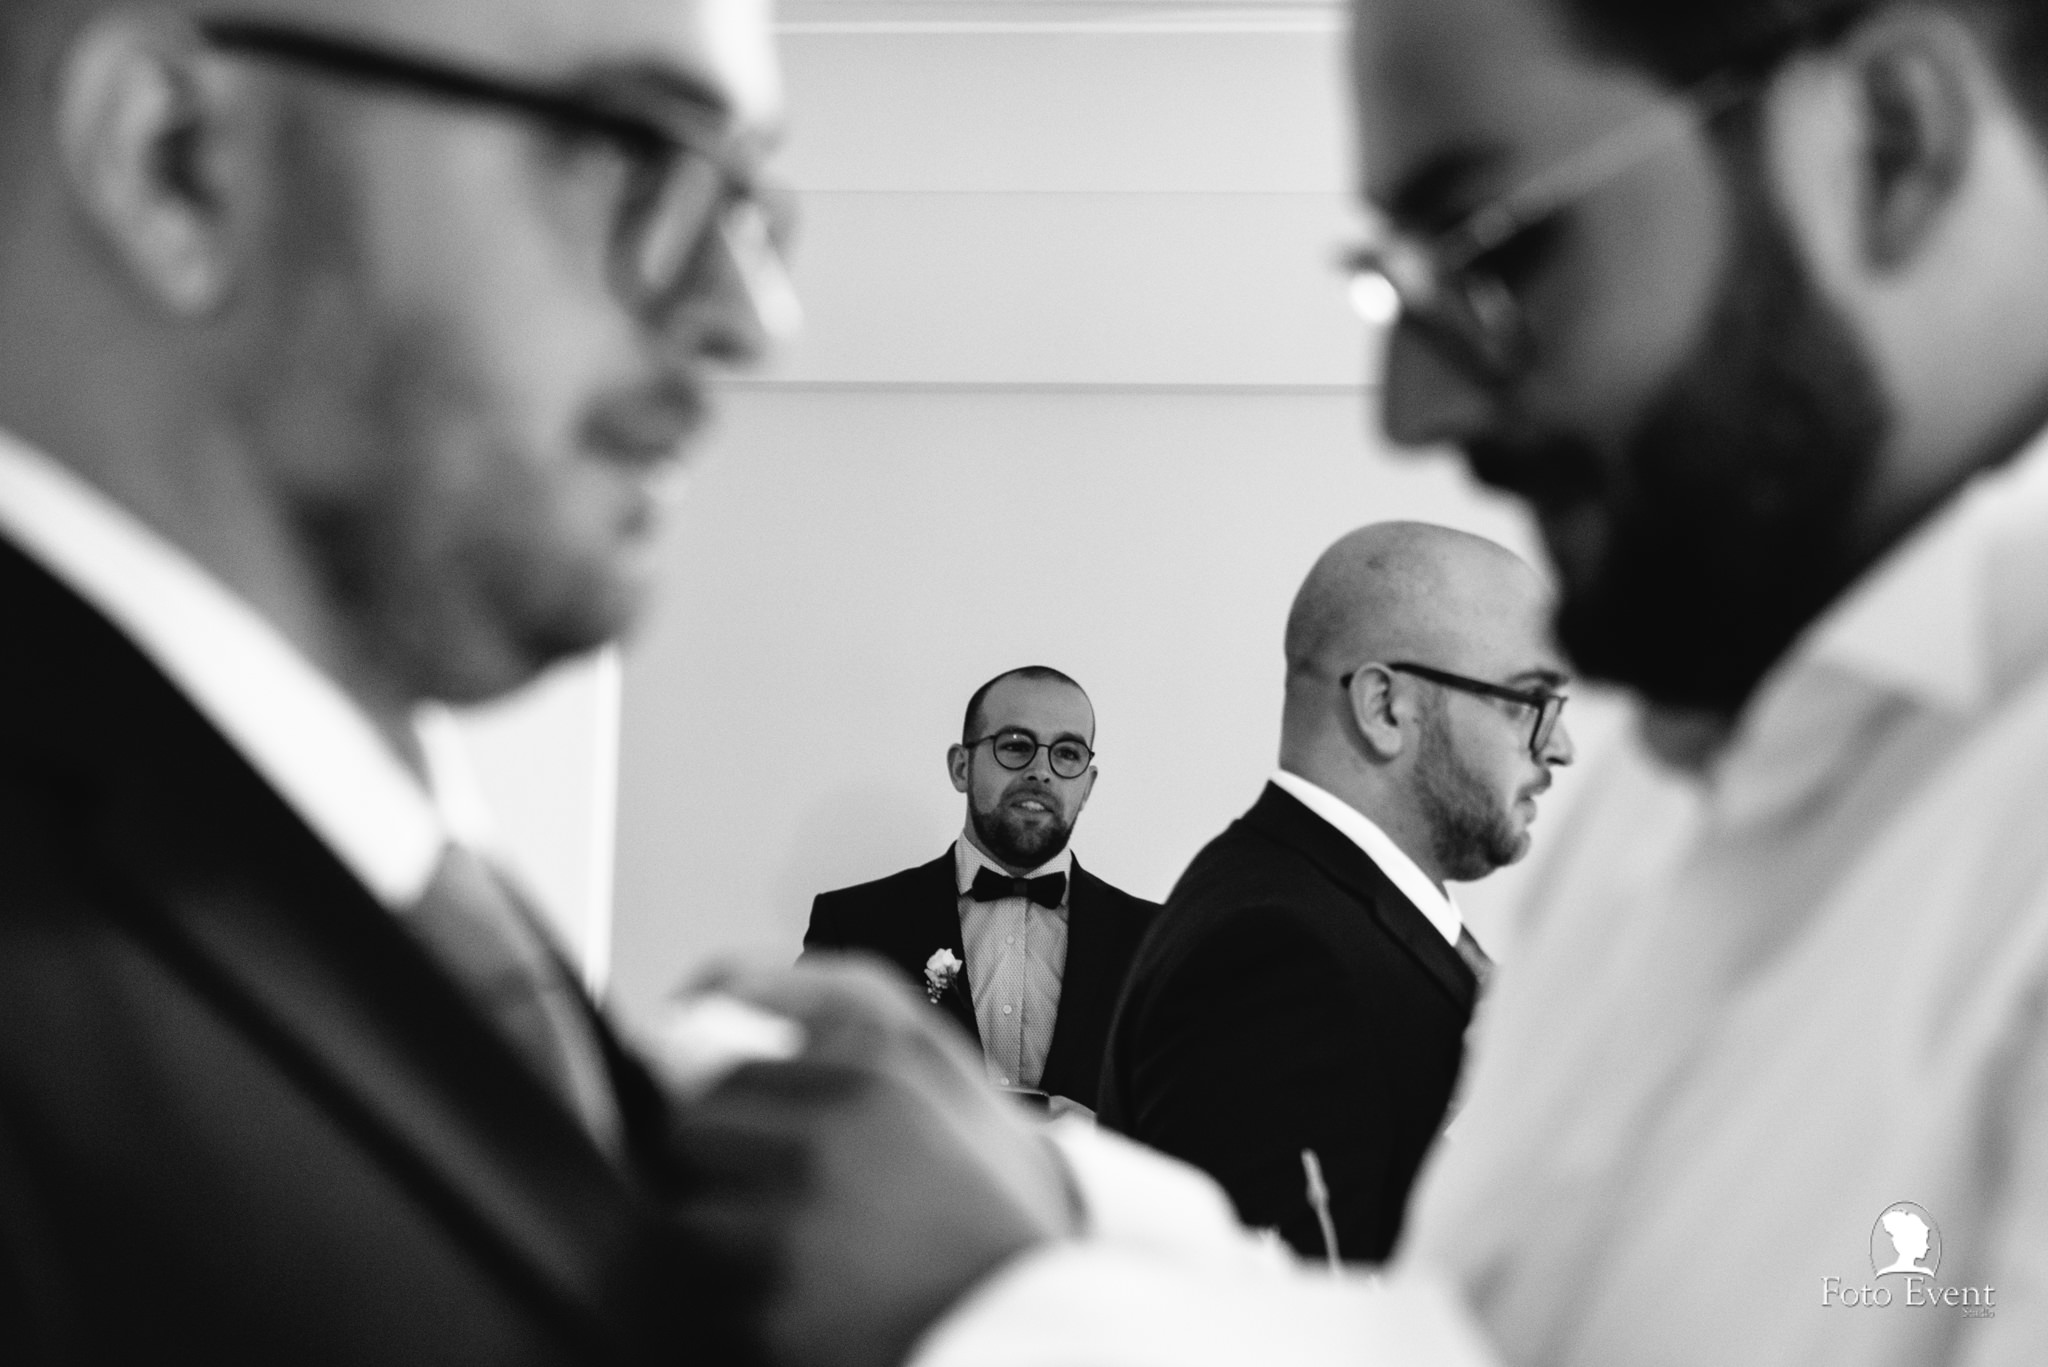 002-2019-09-09-Matrimonio-Dorotea-e-Alberto-Iemmolo-5DN-031